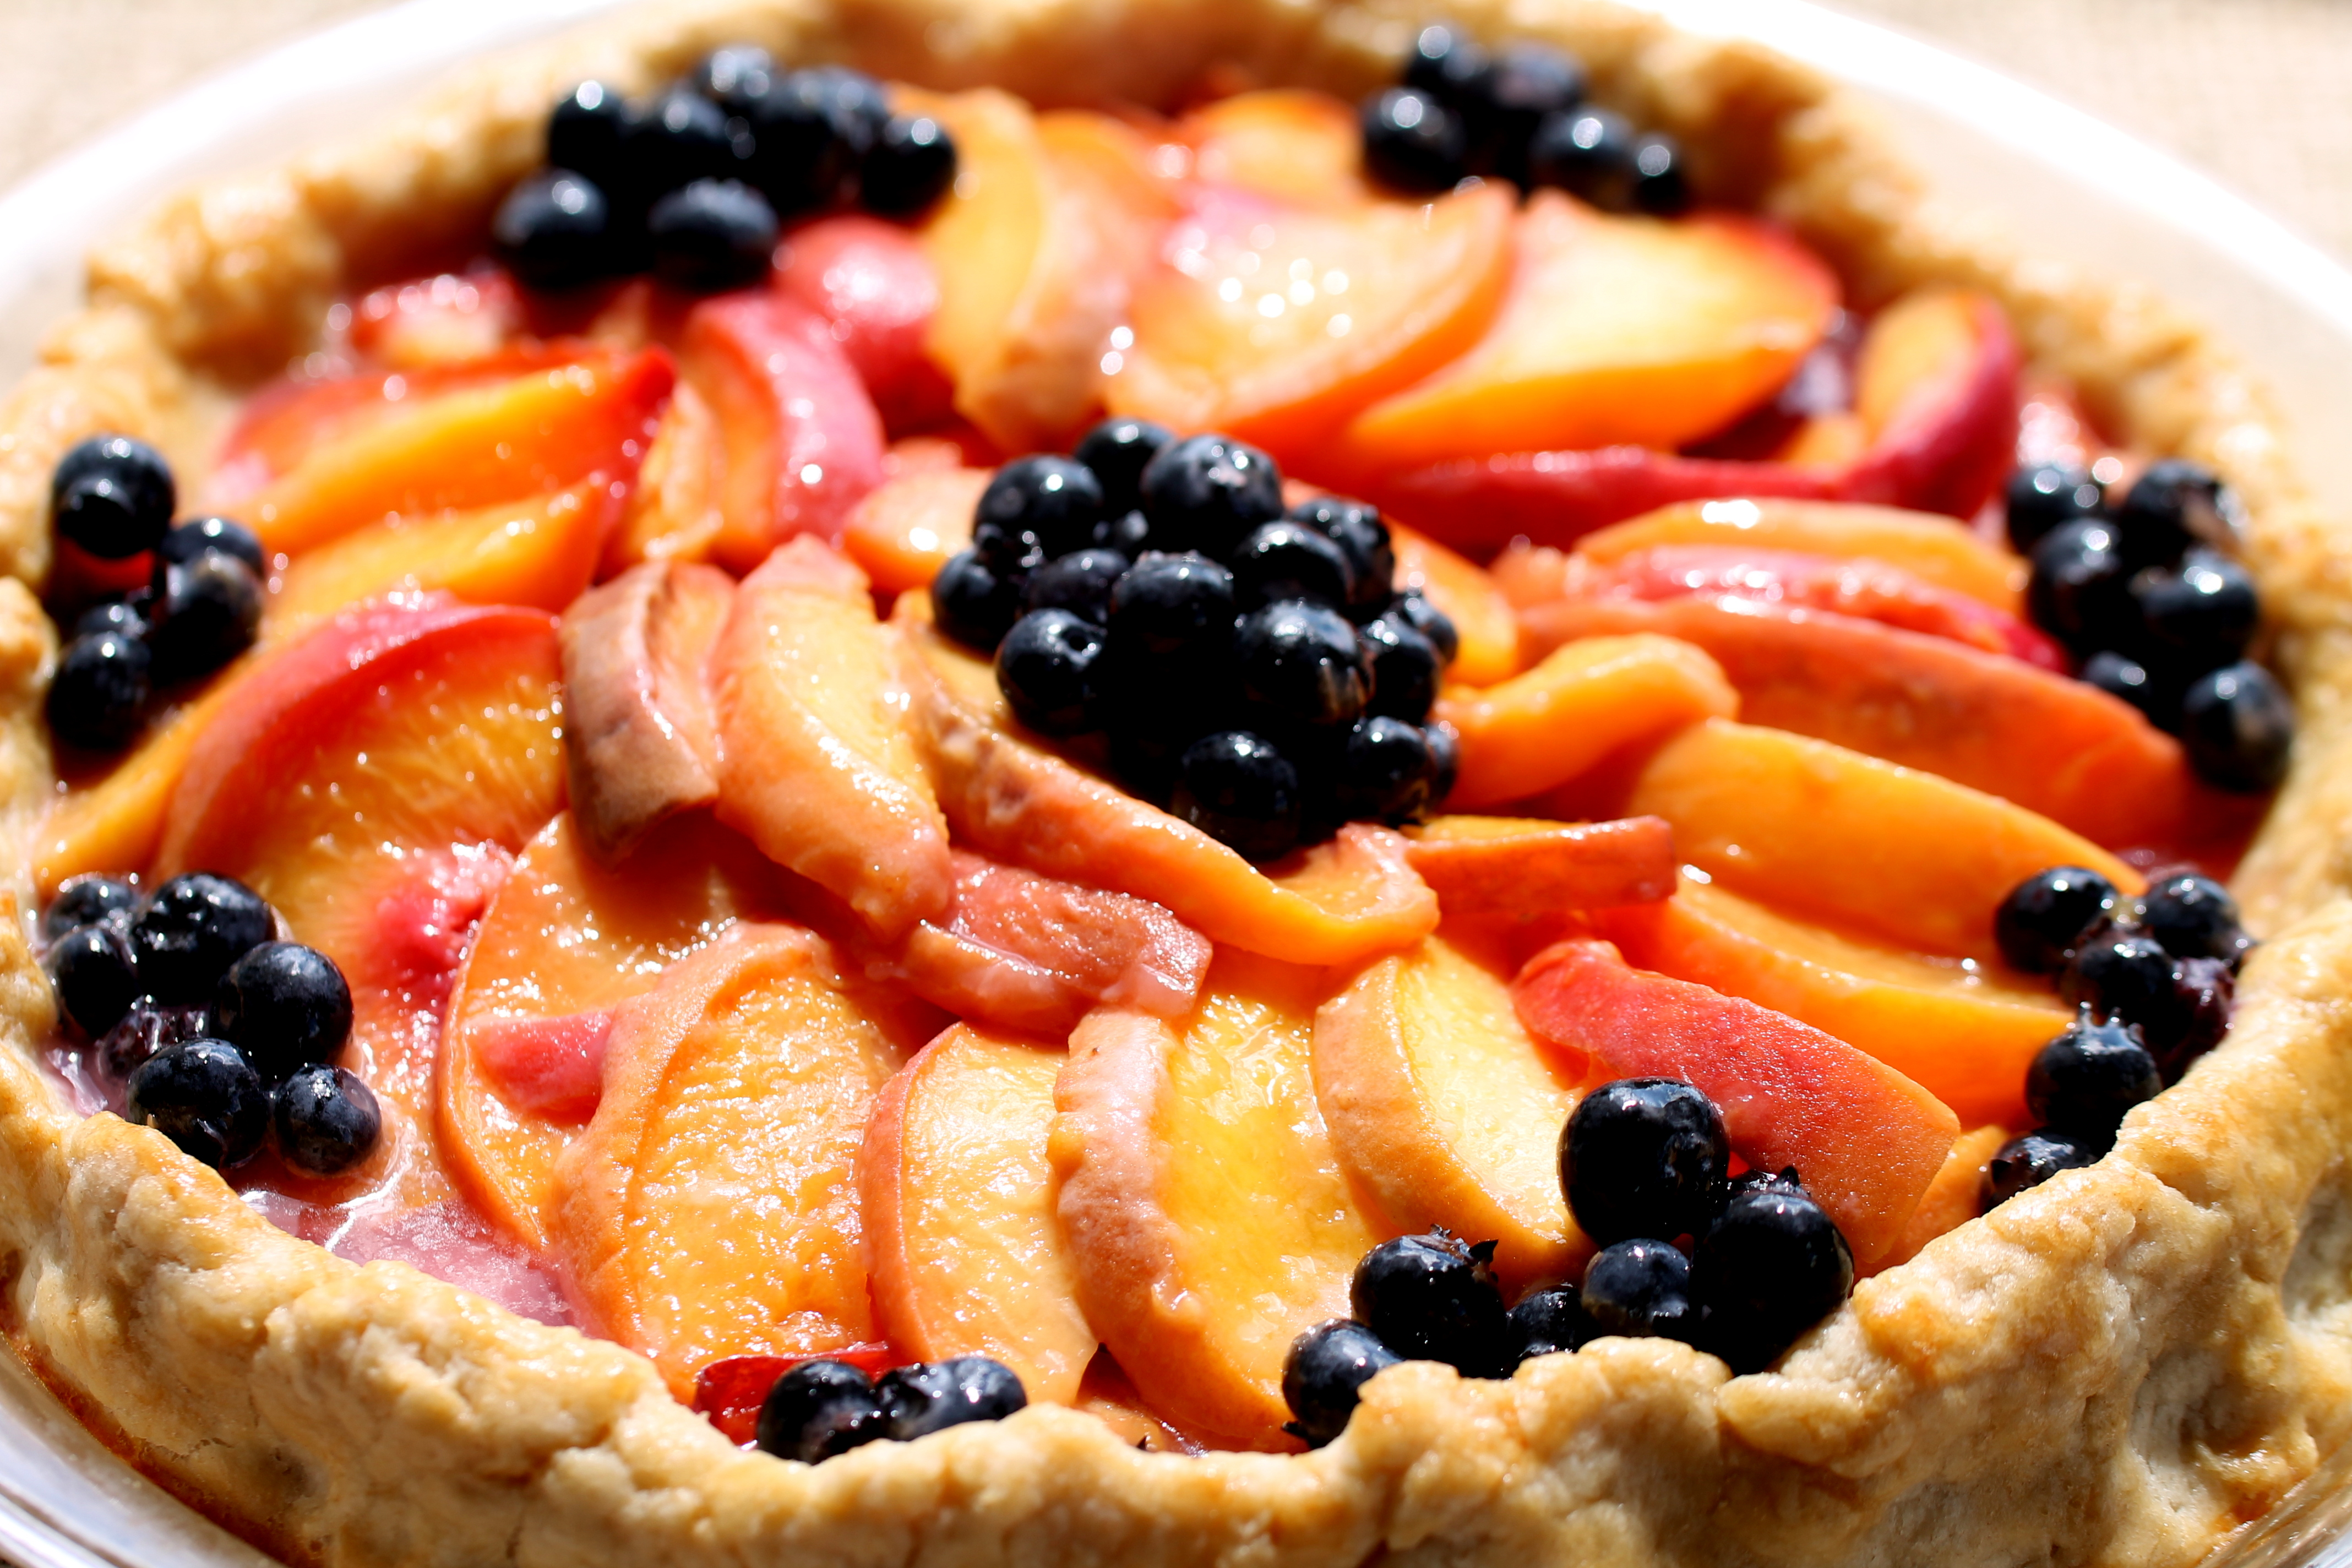 Spiced Peach Blog Celebrates 200 Posts! Peach Cake and Peach Pie on National Peach Day